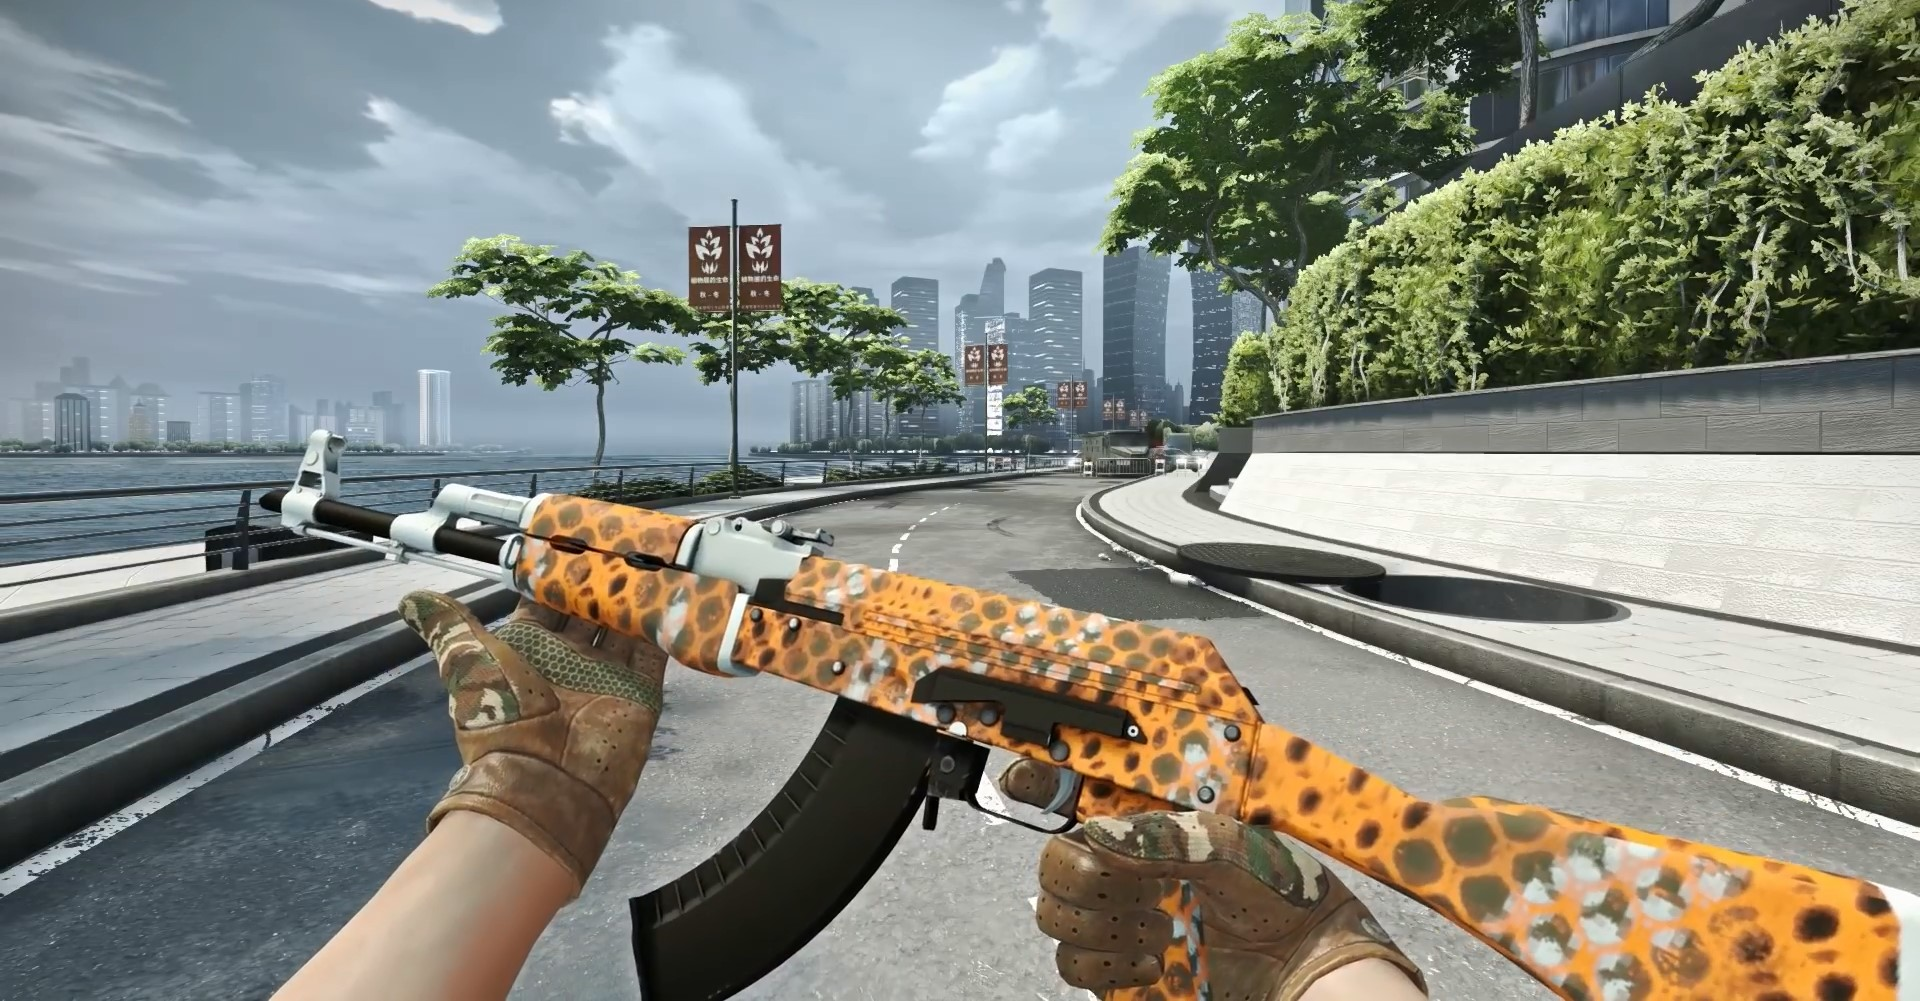 Top 10 CS:GO AK47 Skins (Best CSGO AK-47 Skins) | GAMERS DECIDE